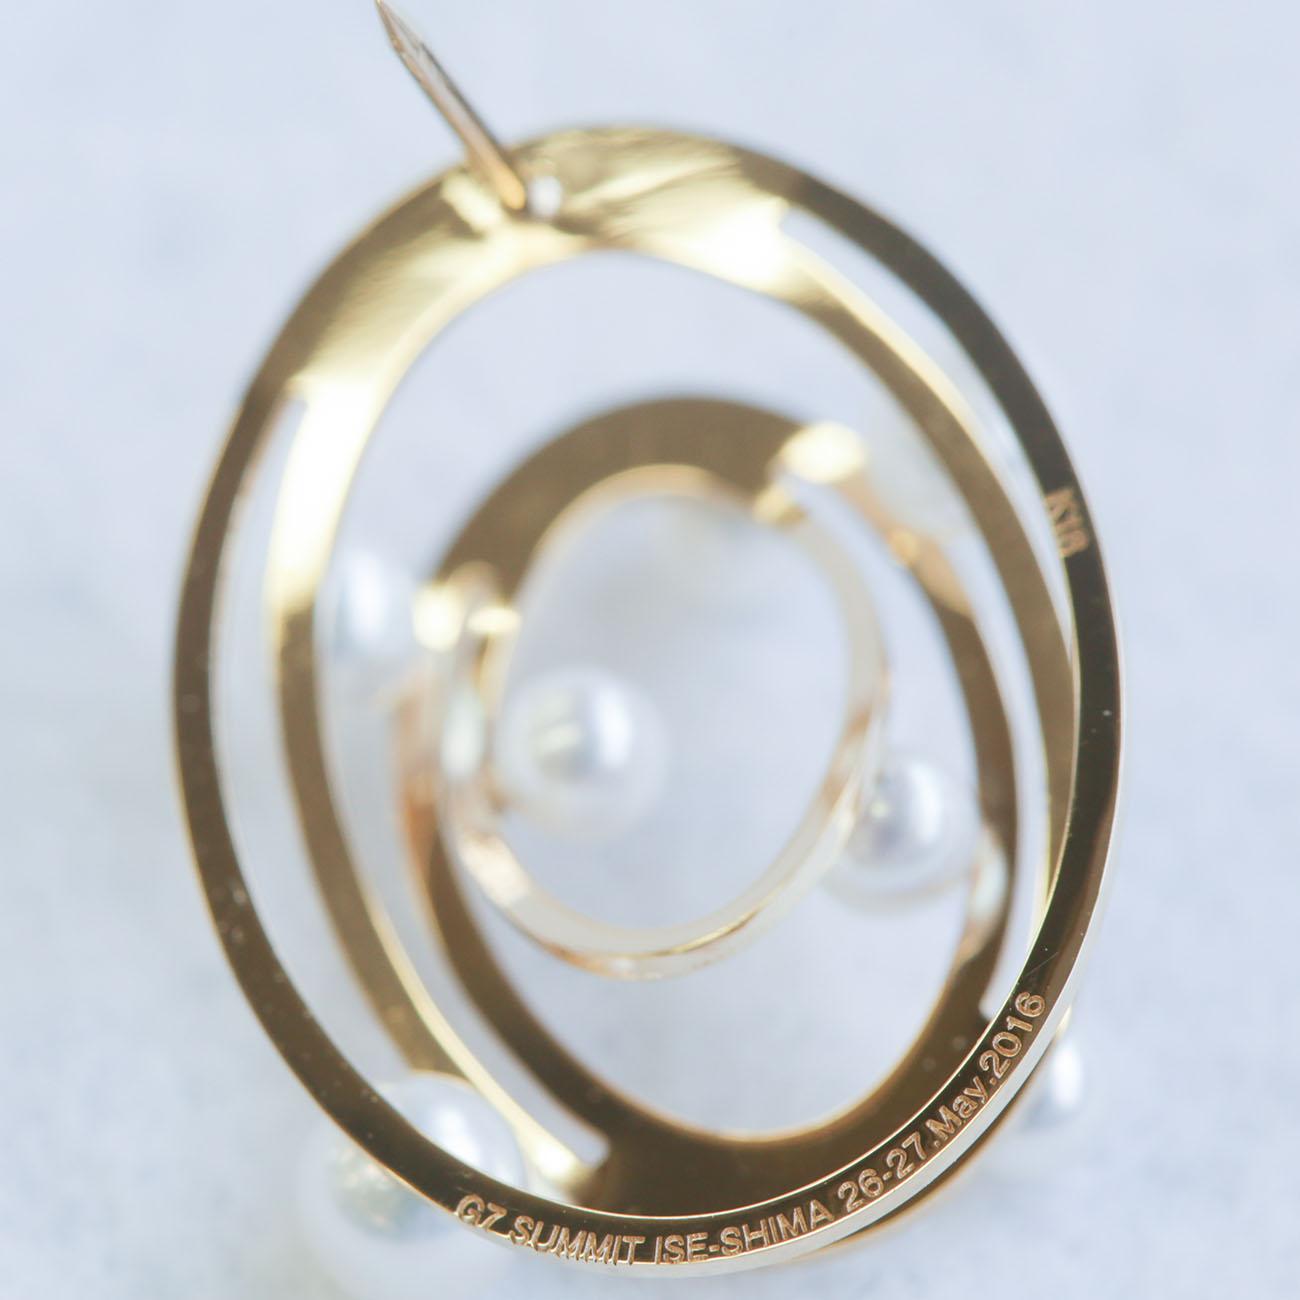 G7ラペルピン|三重県真珠振興協議会